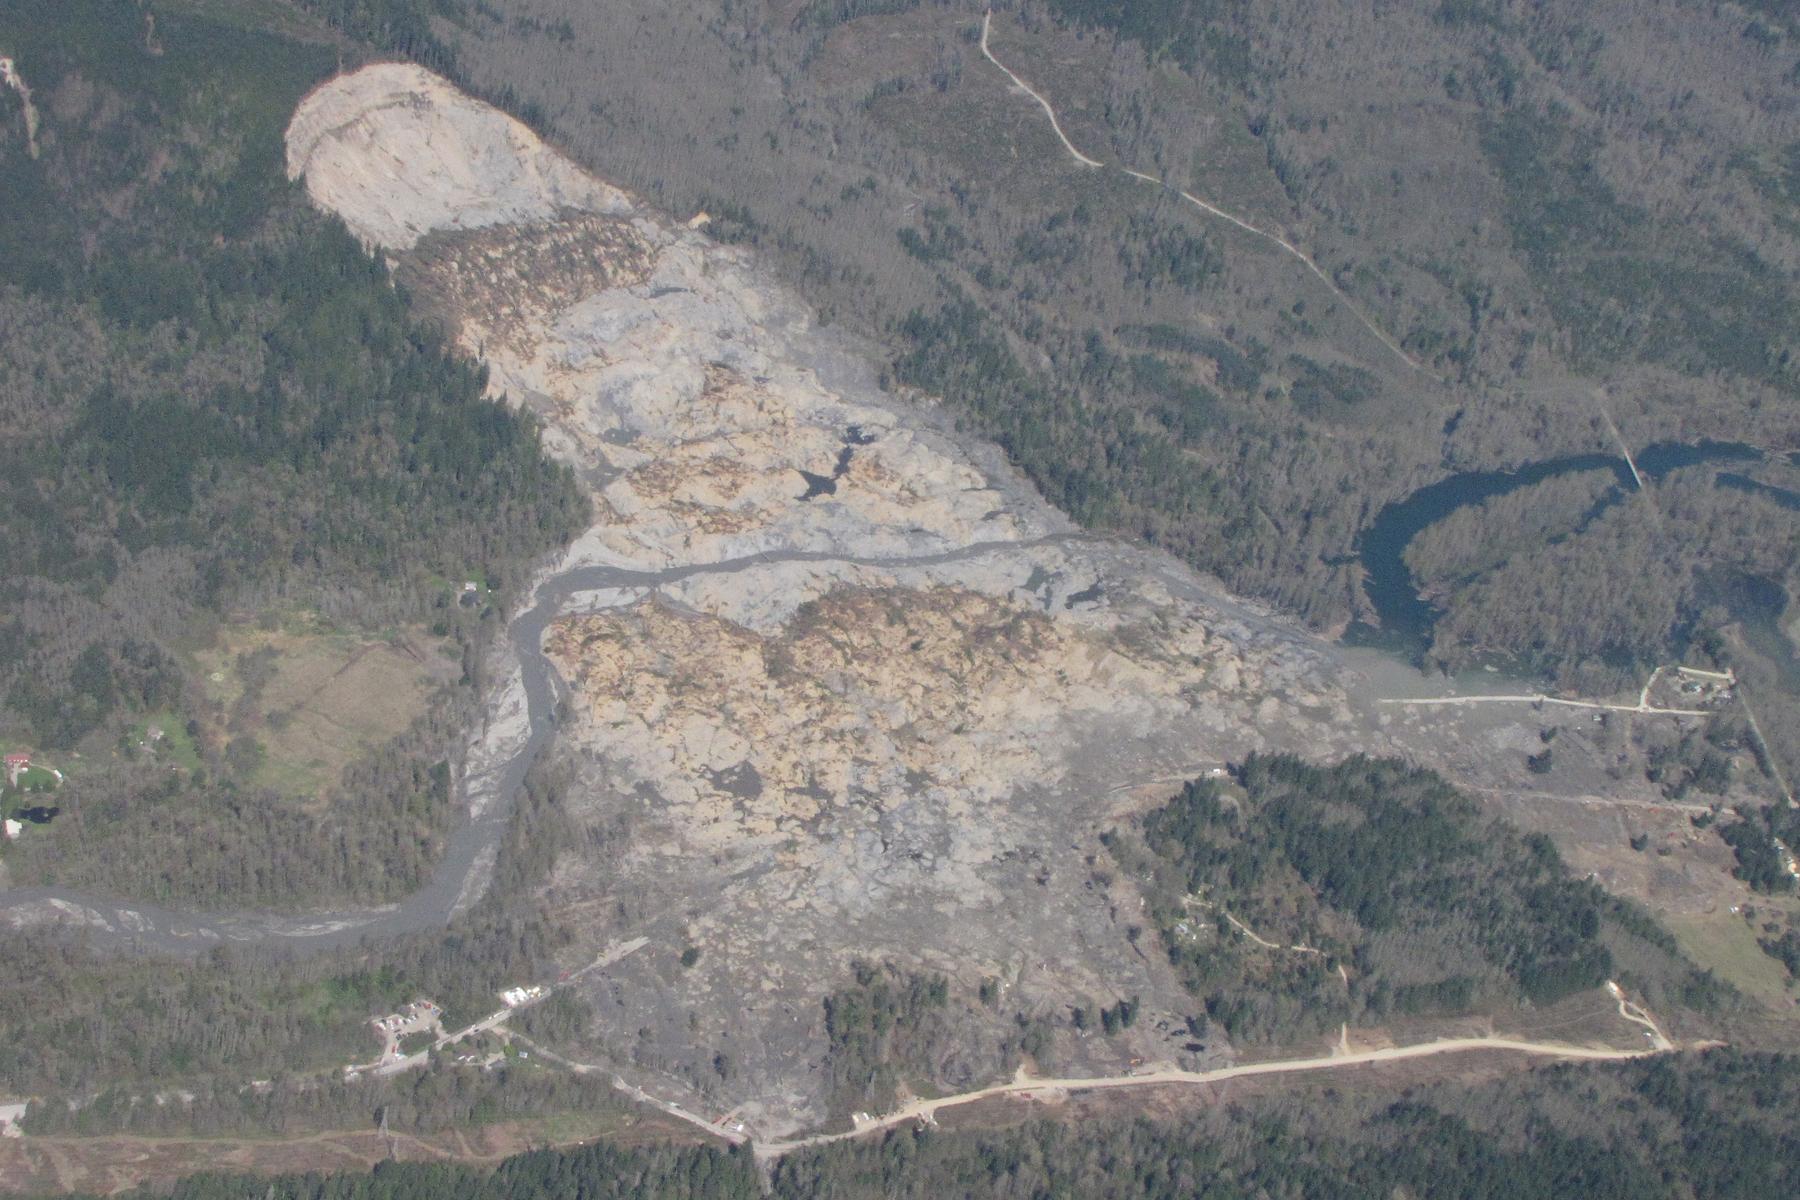 Aerial image of the Oso landslide on April 13, 2014.